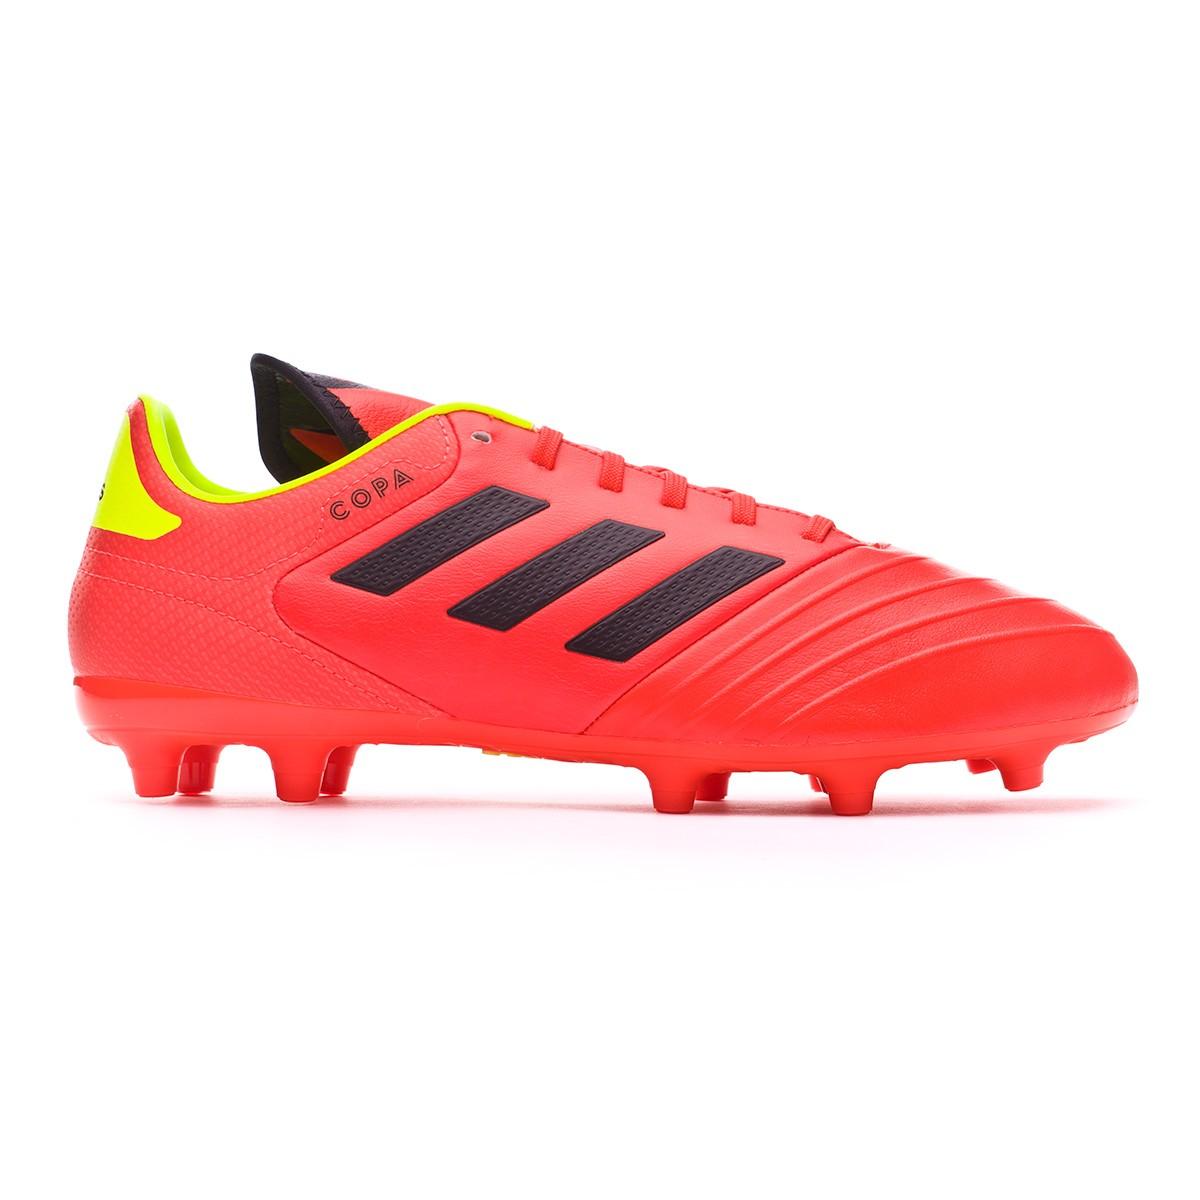 c8112857f52 Football Boots adidas Copa 18.3 FG Solar red-Black-Solar yellow - Football  store Fútbol Emotion